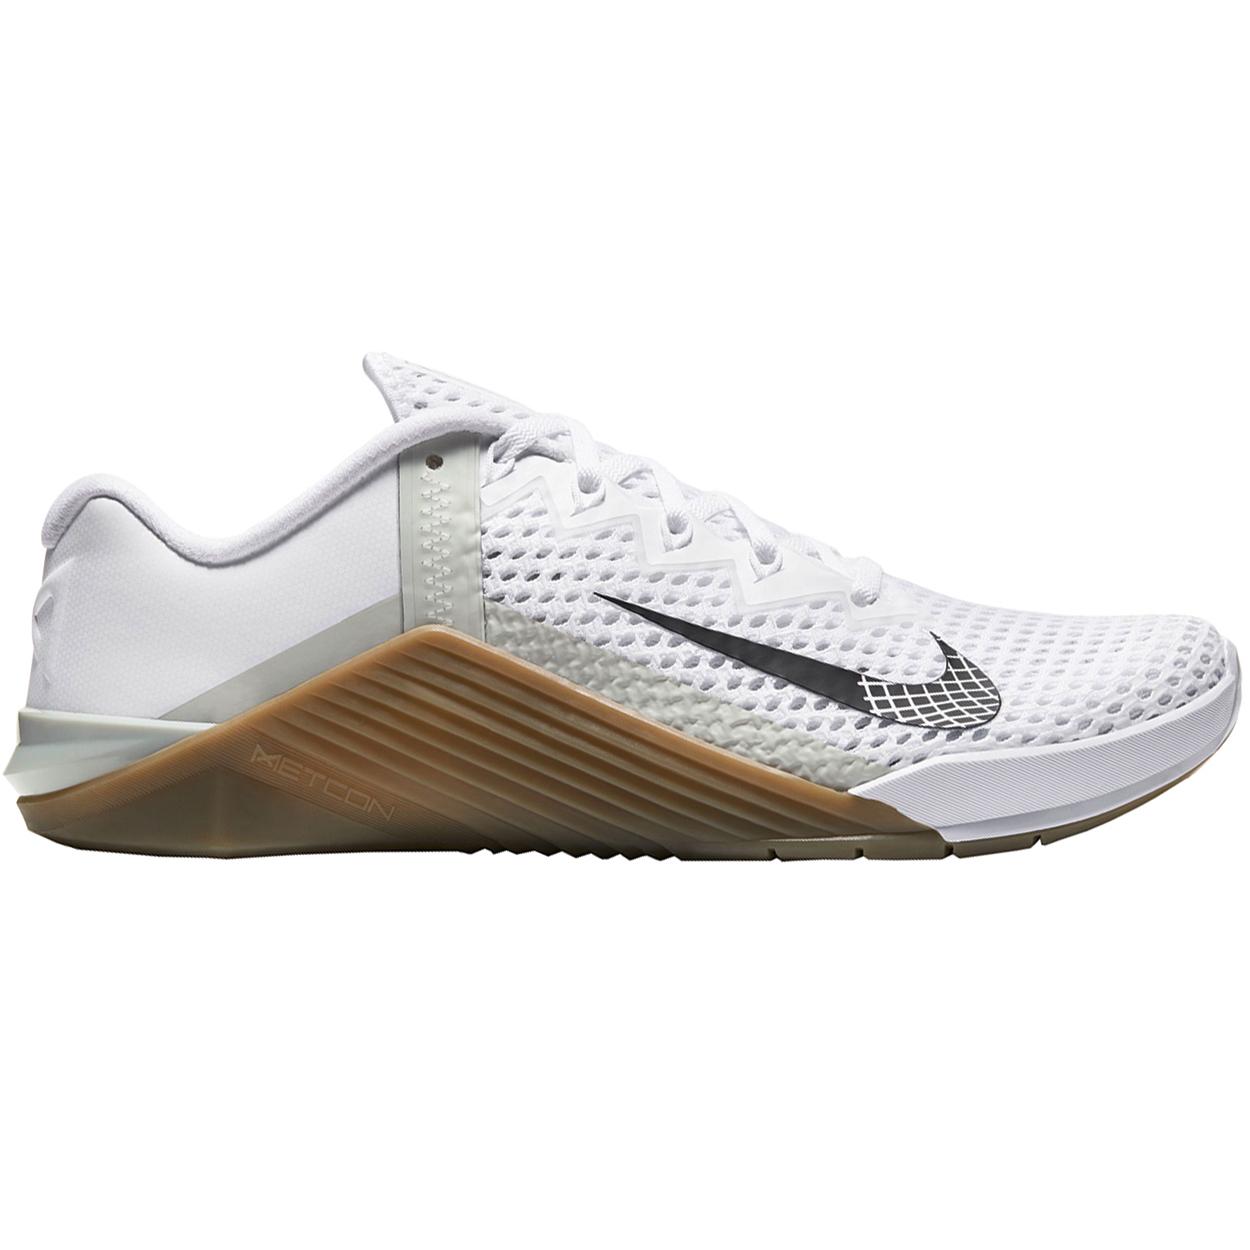 Nike Metcon 6 Trainingsschuh Fitness weiß grau CK9388 101